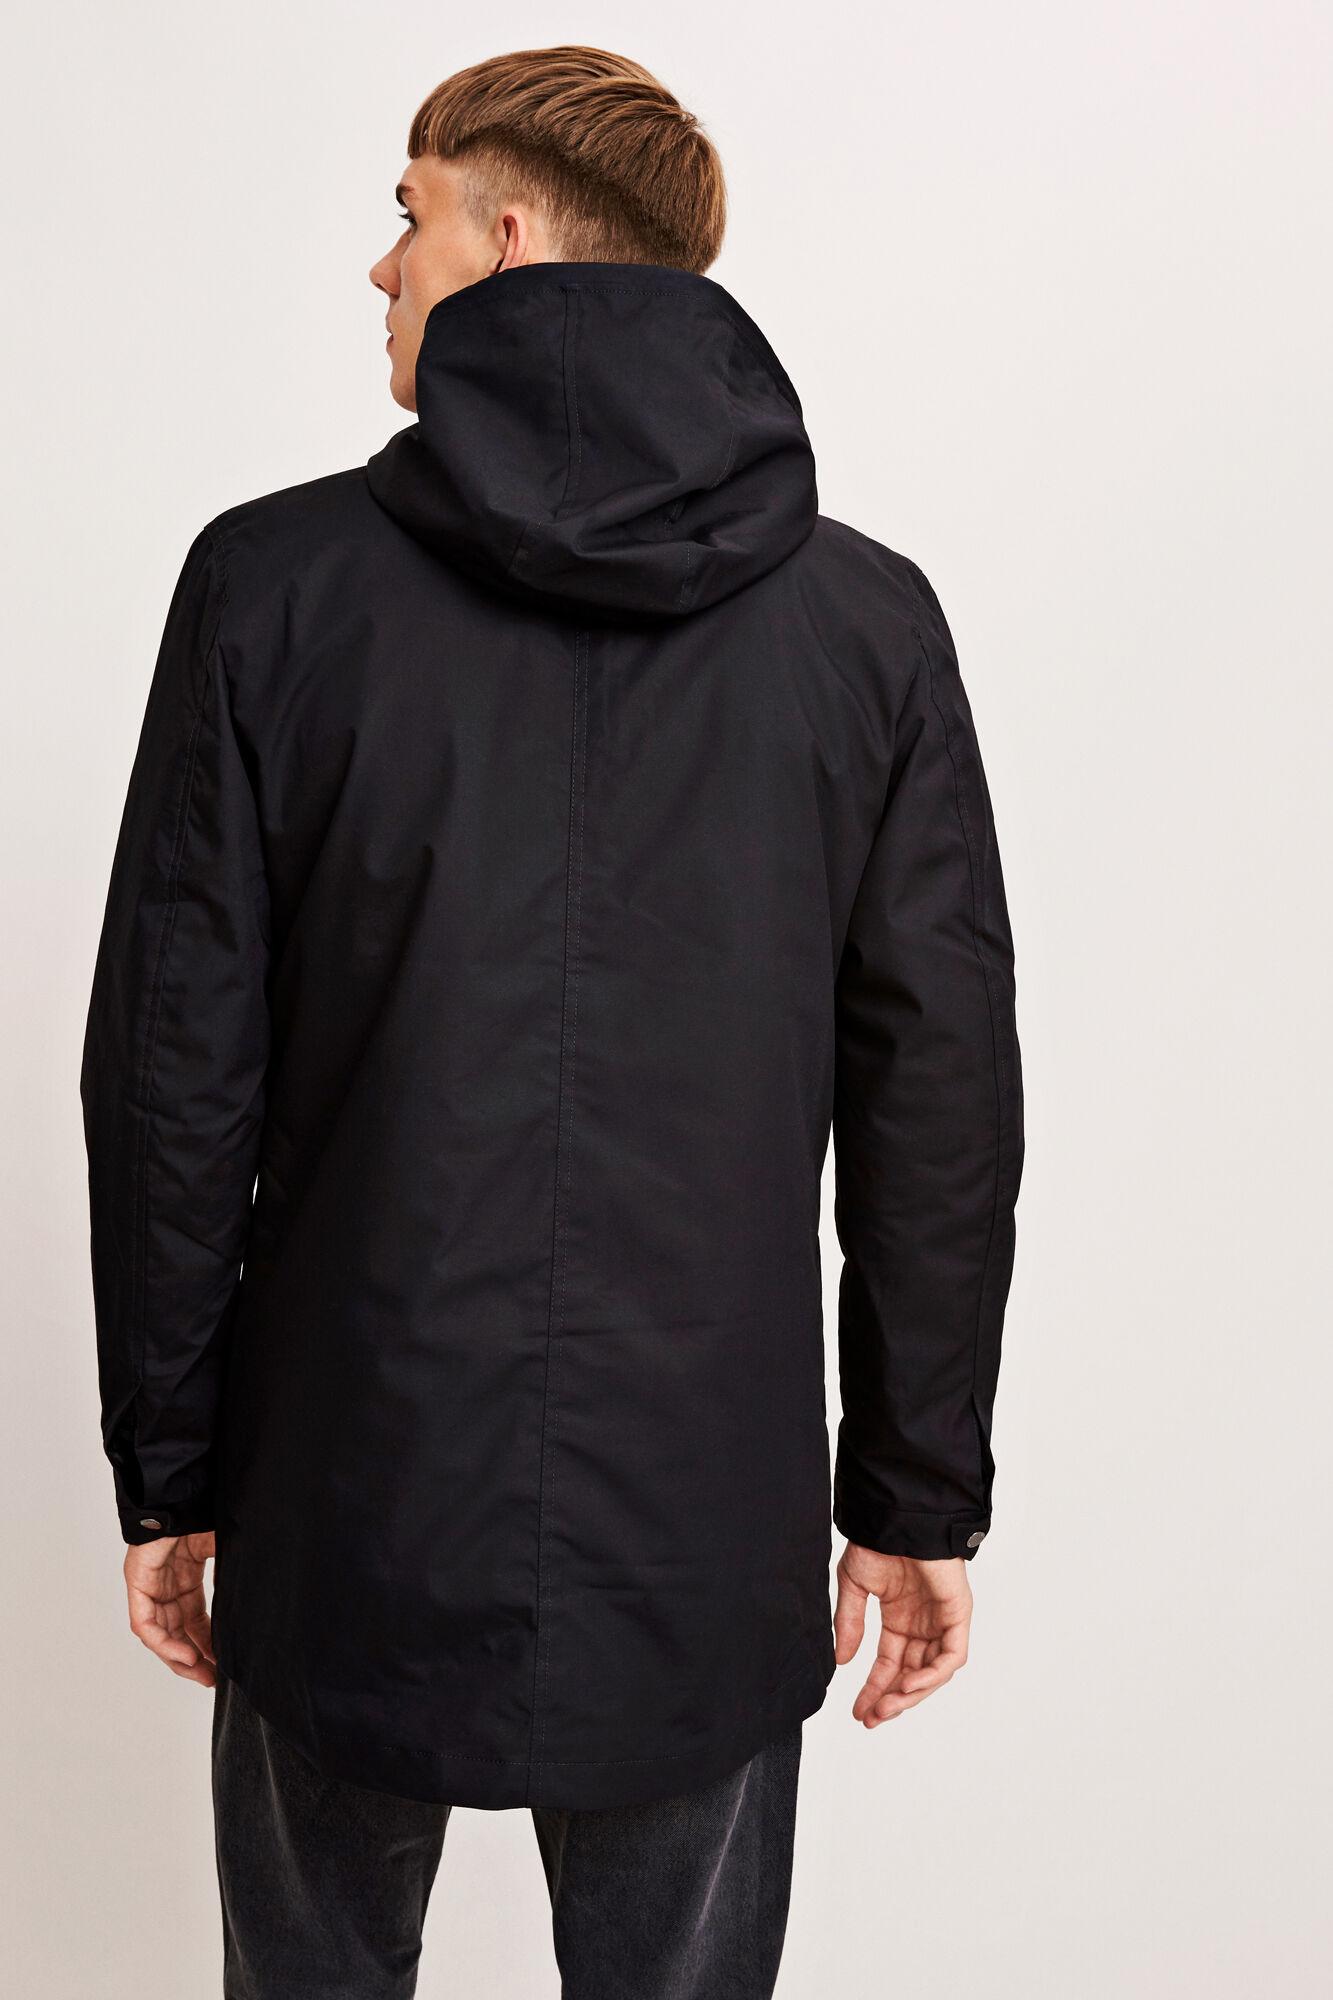 Beaufort jacket 3955